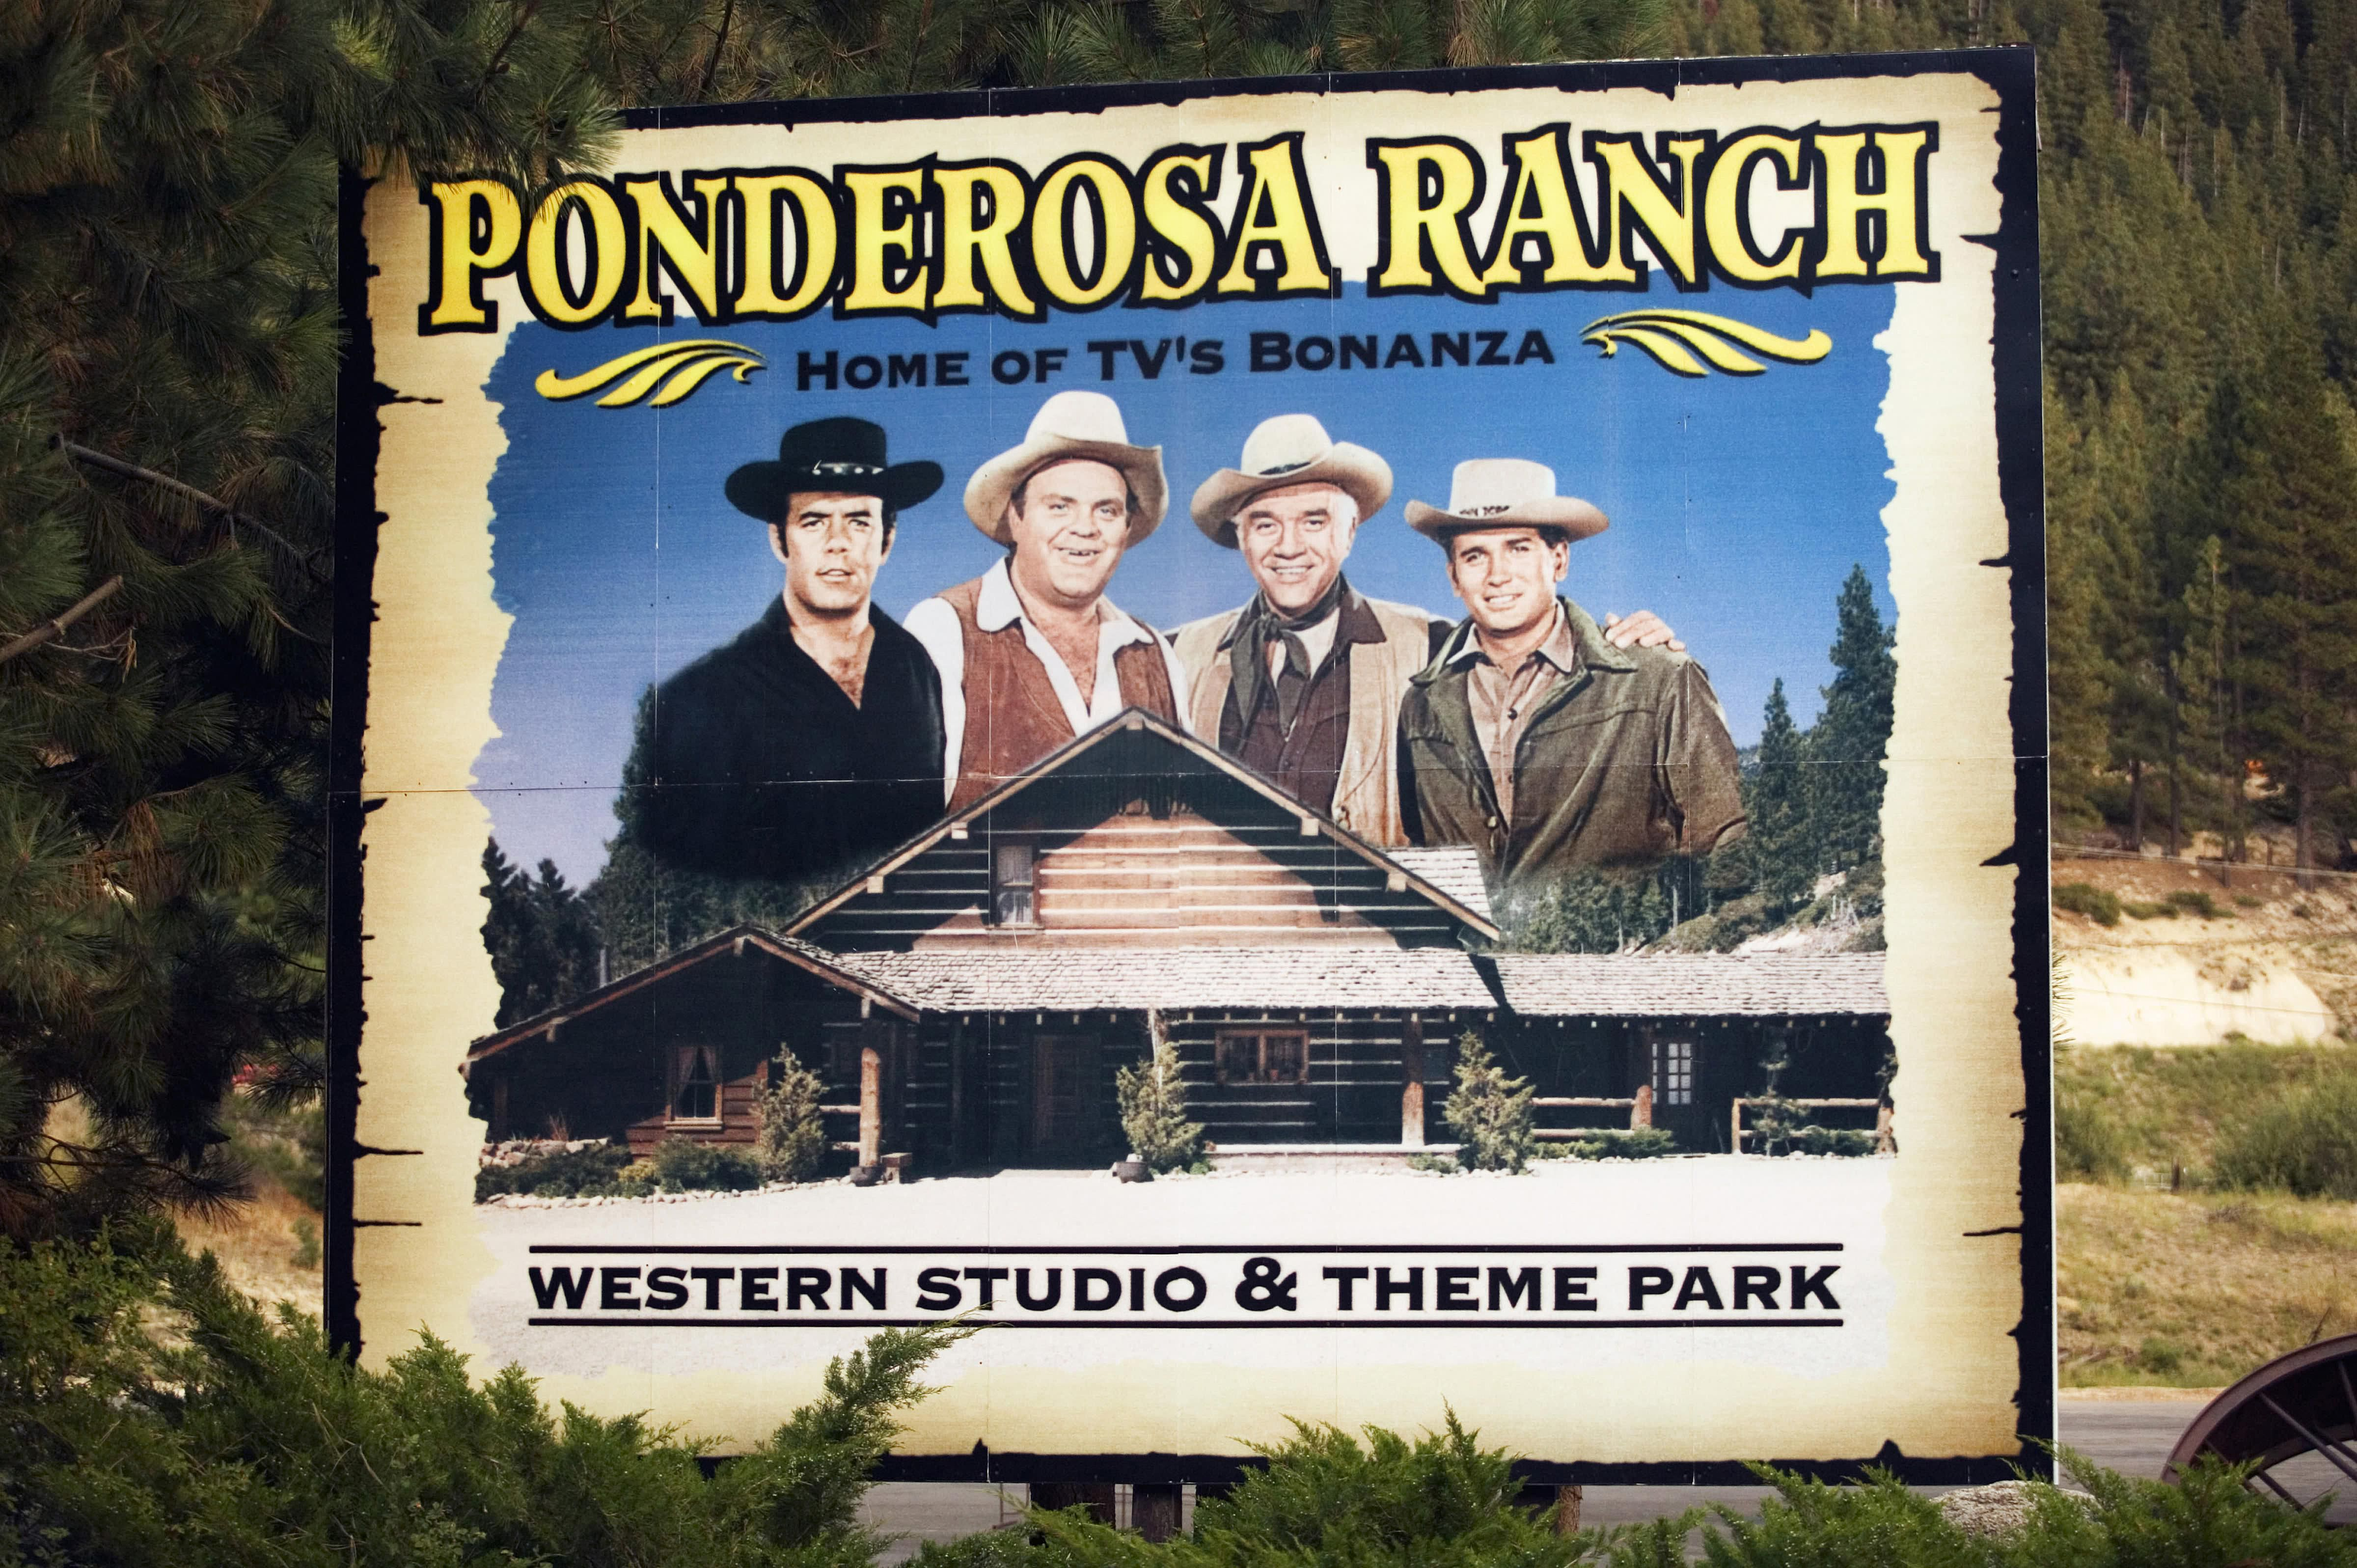 ponderosa ranch bonanza tv location at lake tahoe. Black Bedroom Furniture Sets. Home Design Ideas